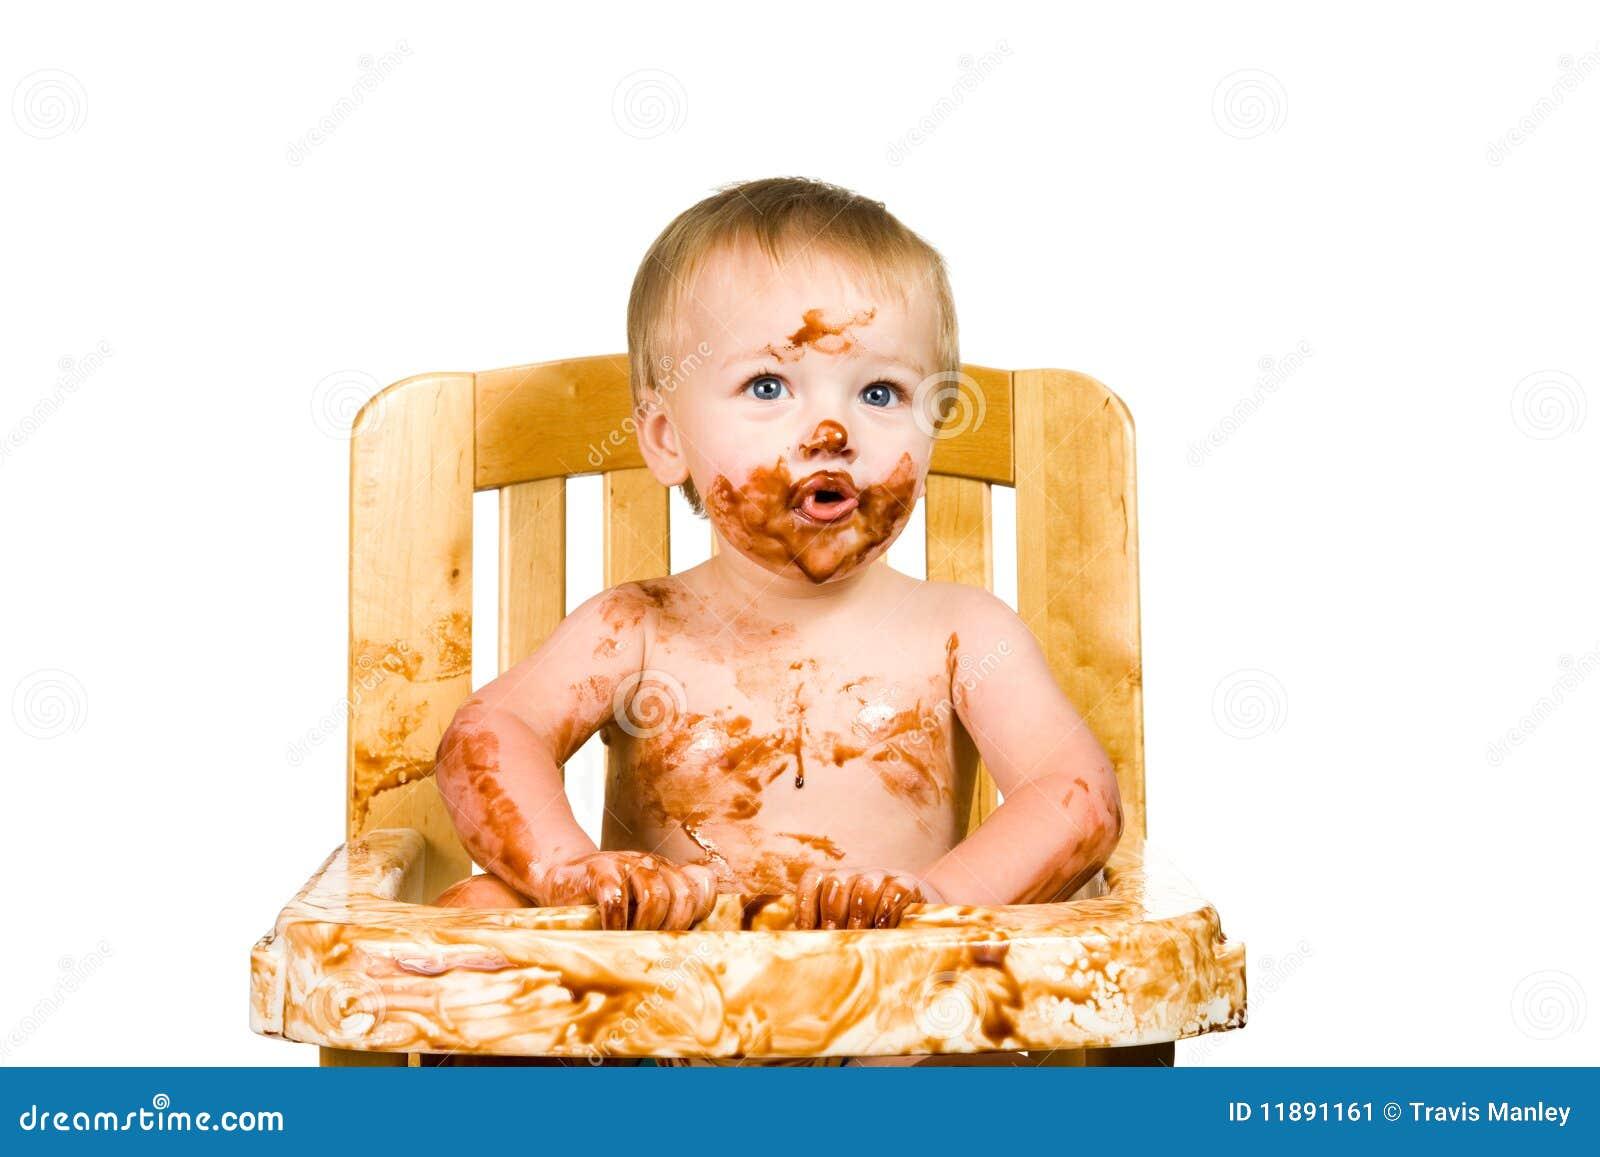 messy baby boy isolated stock image image 11891161 baby wearing bib clipart baby wearing bib clipart